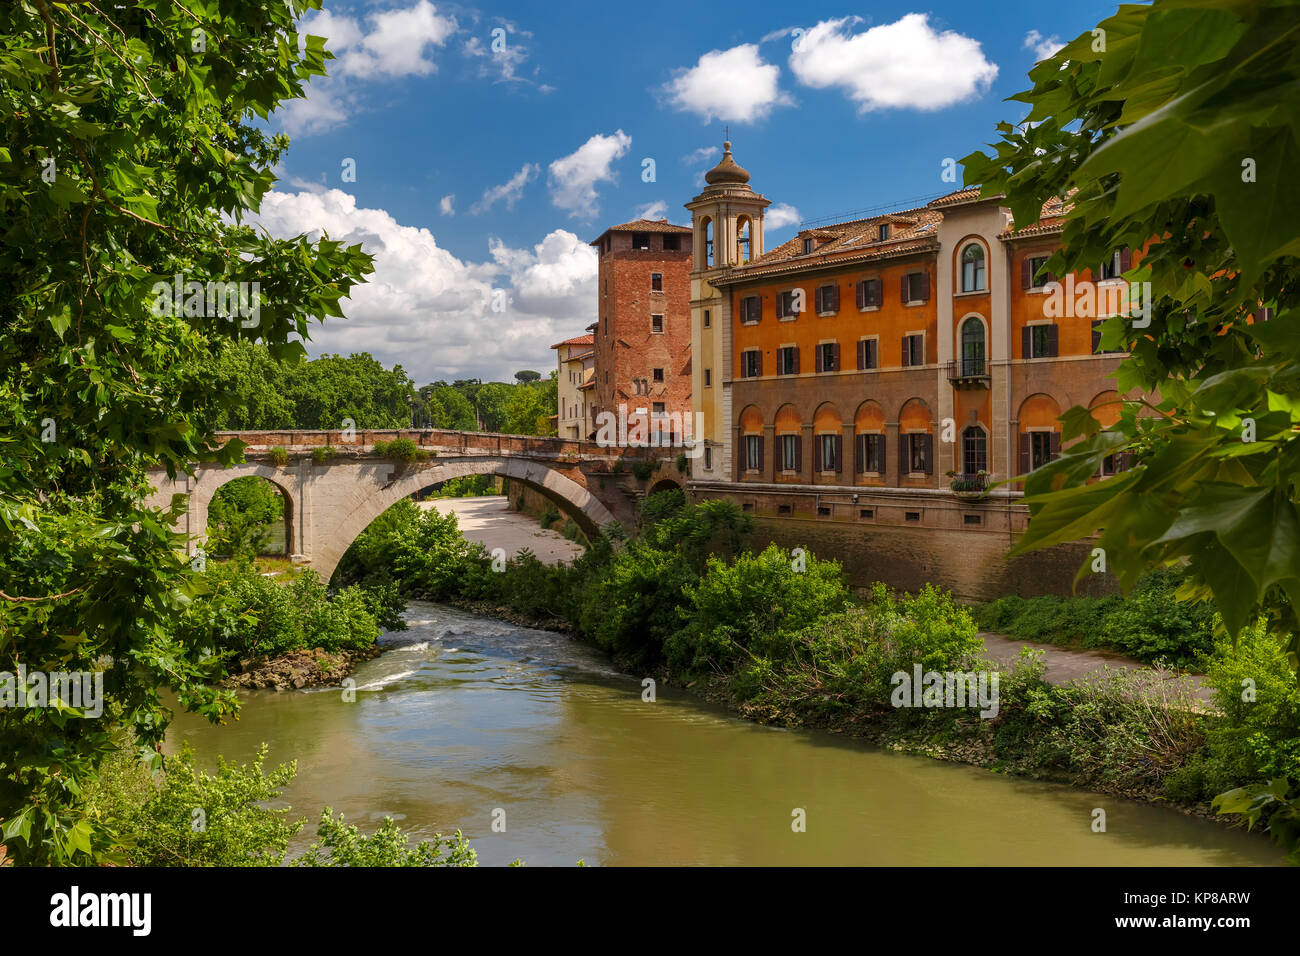 Tiber island in sunny day, Rome, Italy - Stock Image